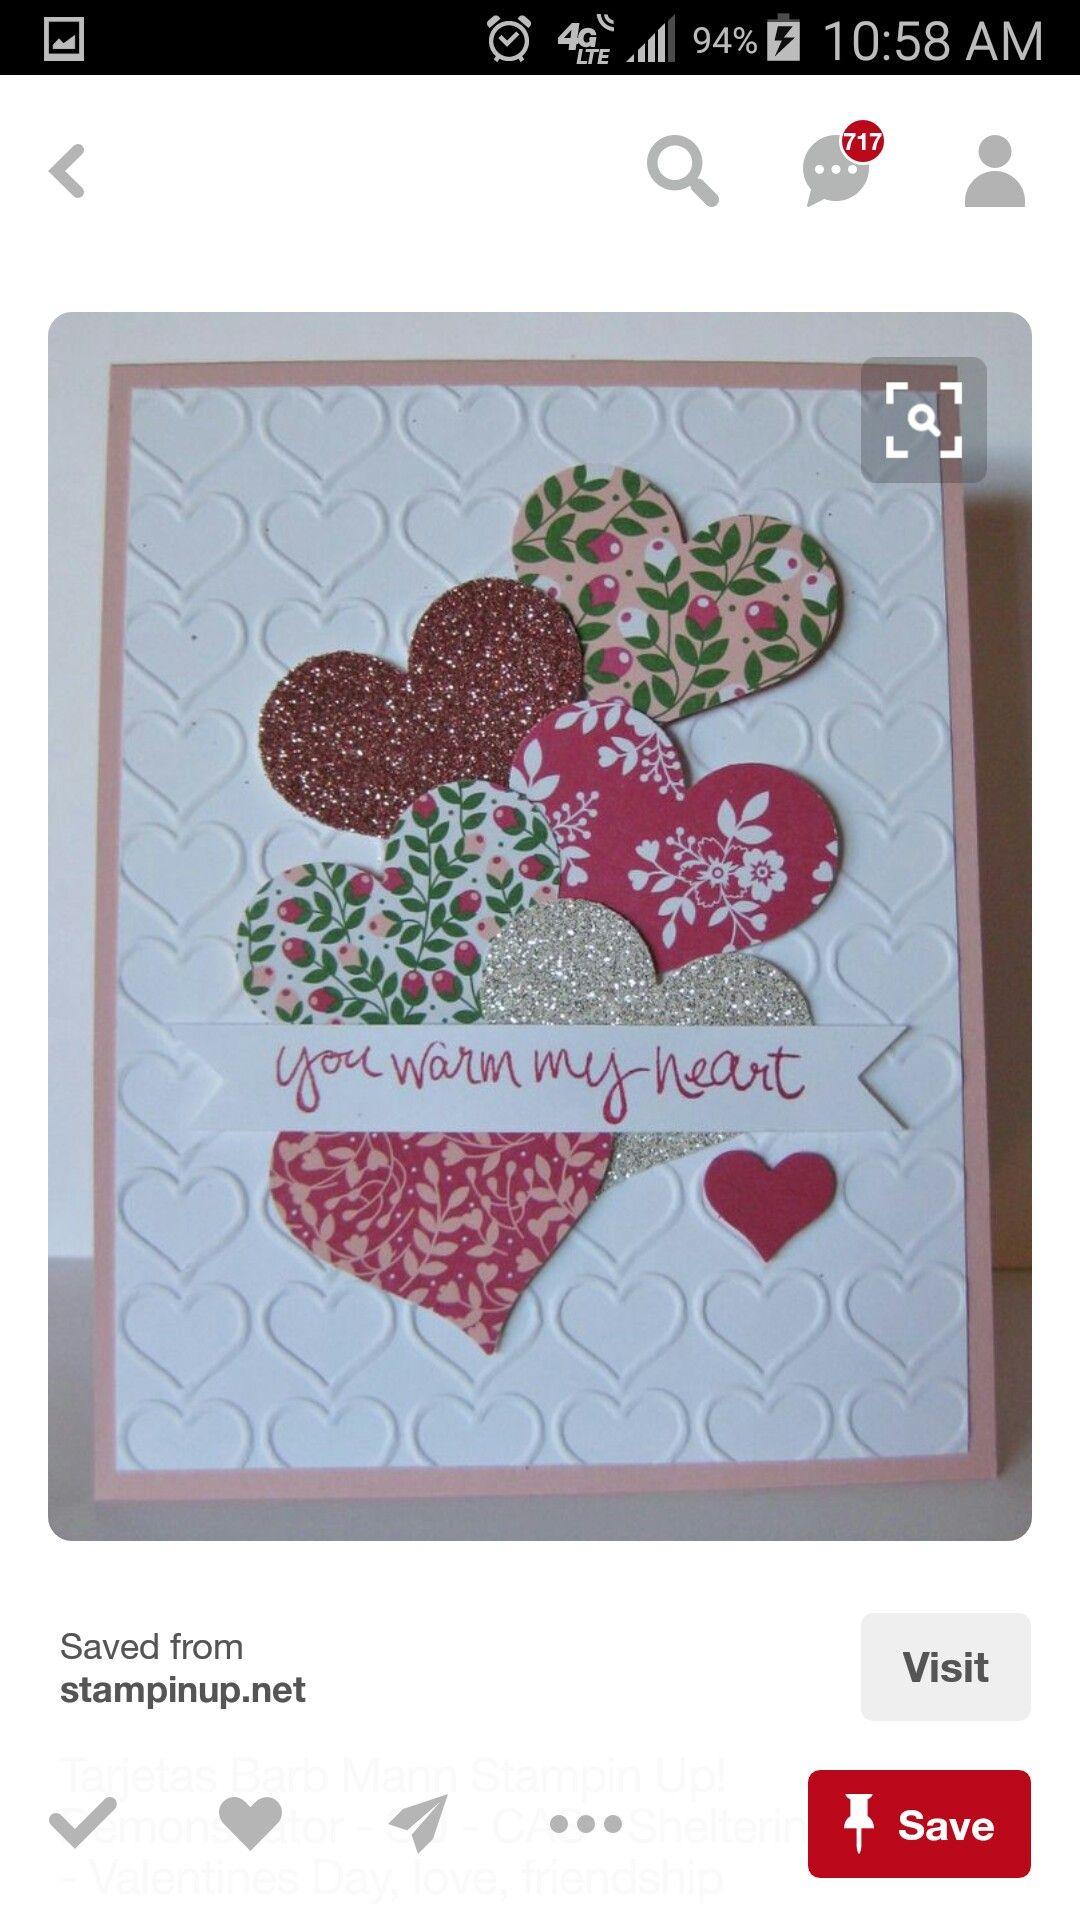 Pin by Paula Poindexter on 4 Screenshots | Pinterest | Cards, Card ...